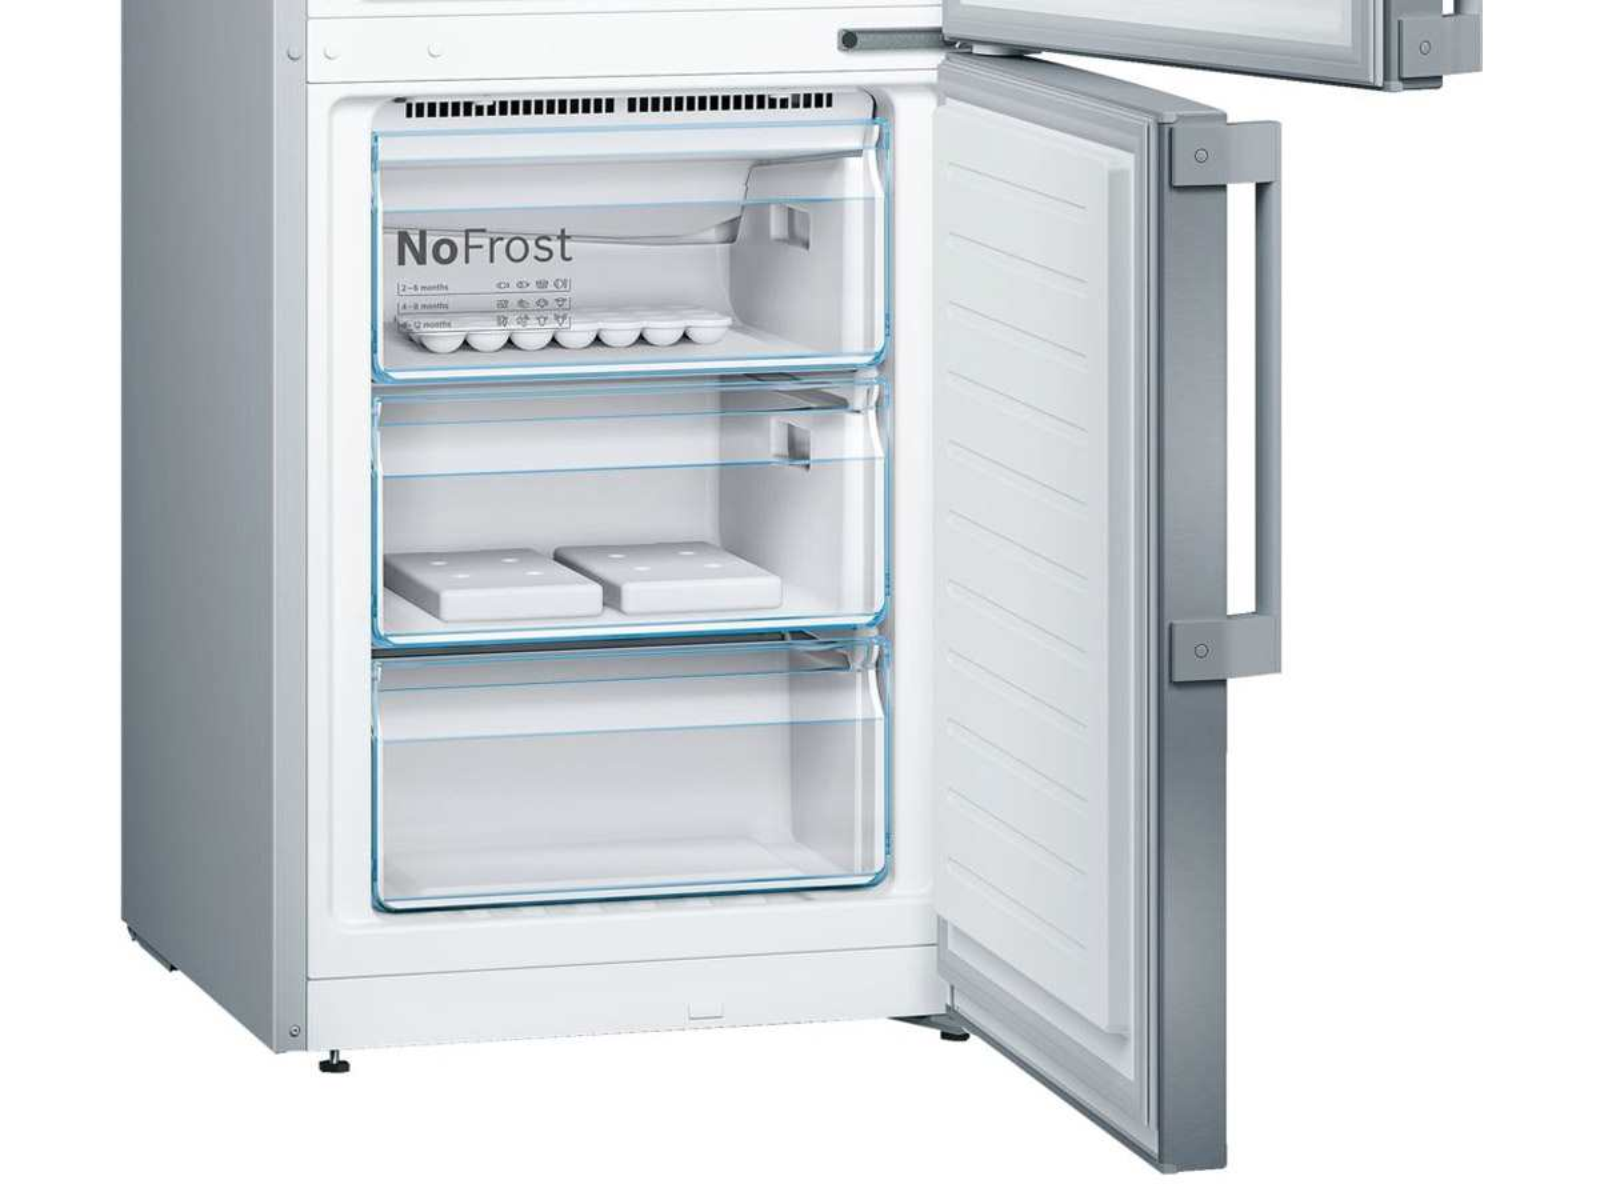 Bosch Kühlschrank No Frost Kühlt Nicht : Liebherr kühlschrank biofresh kühlt nicht: kühlschrank kühl